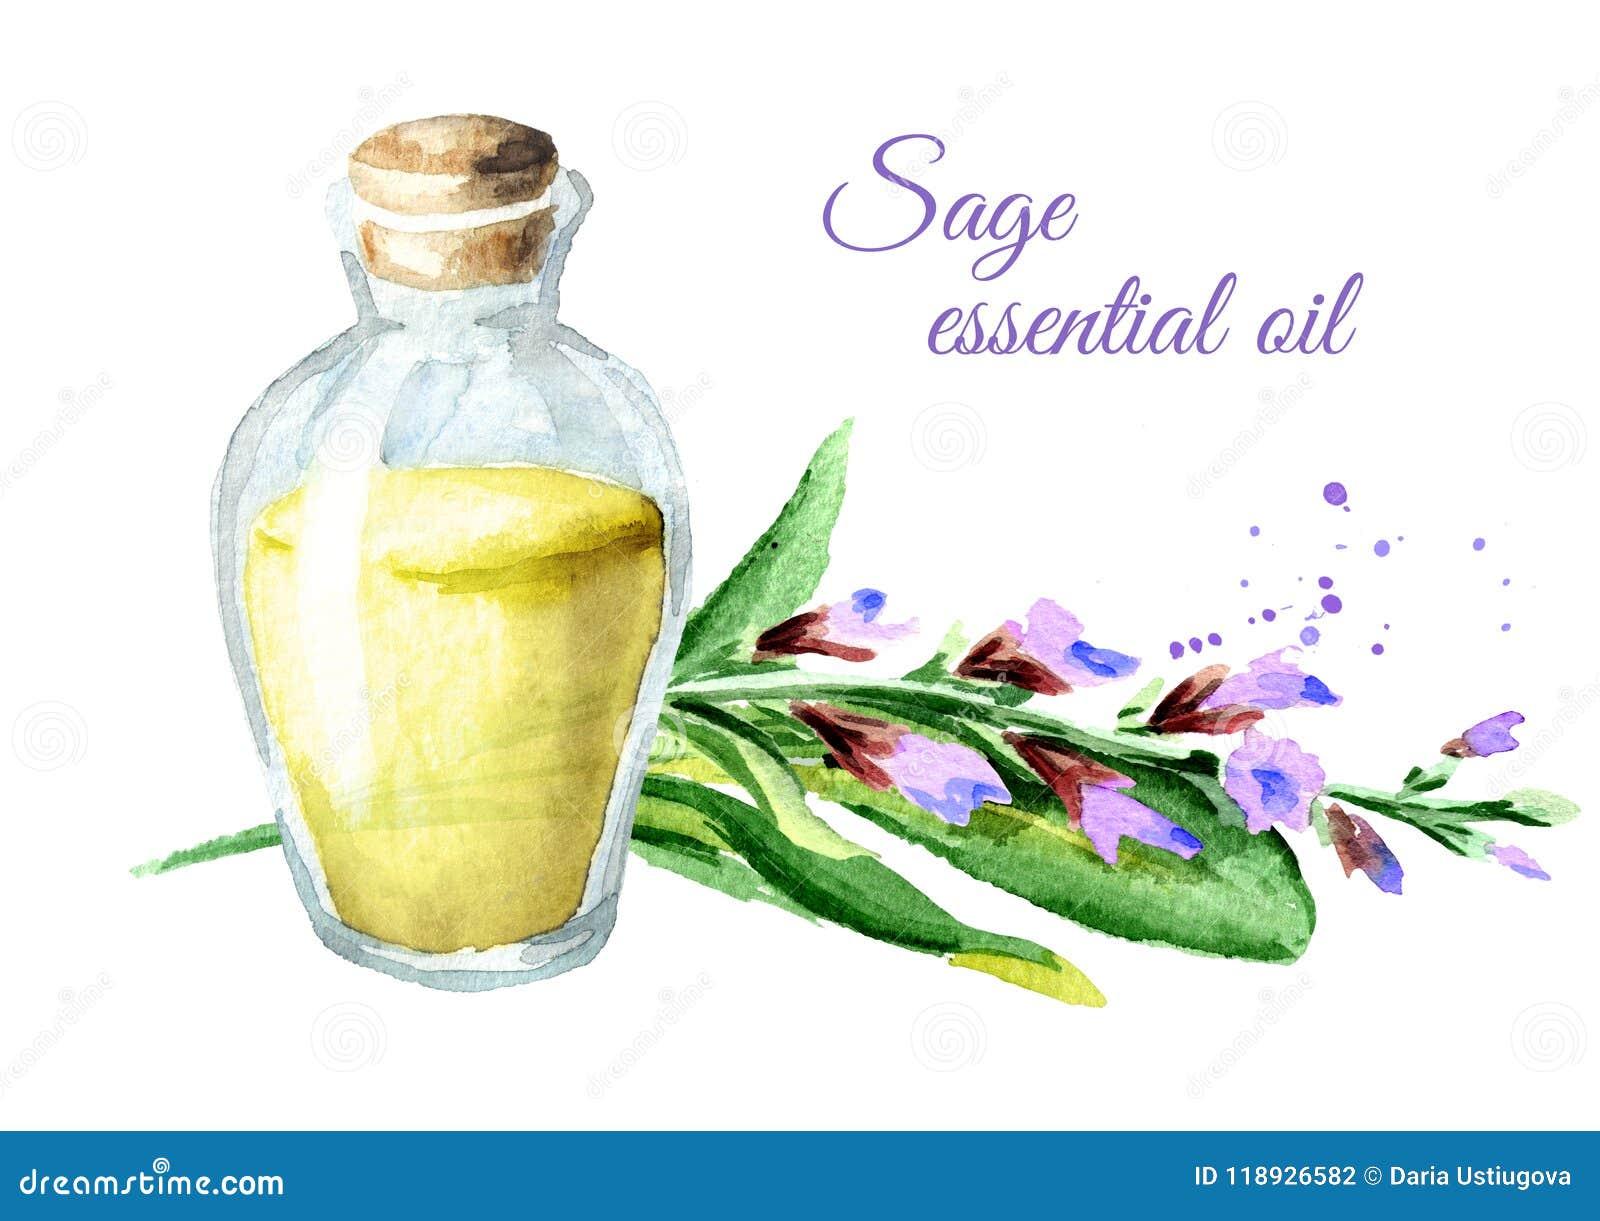 Sage essential oil watercolor hand drawn illustration isolated on sage essential oil watercolor hand drawn illustration isolated on white background mightylinksfo